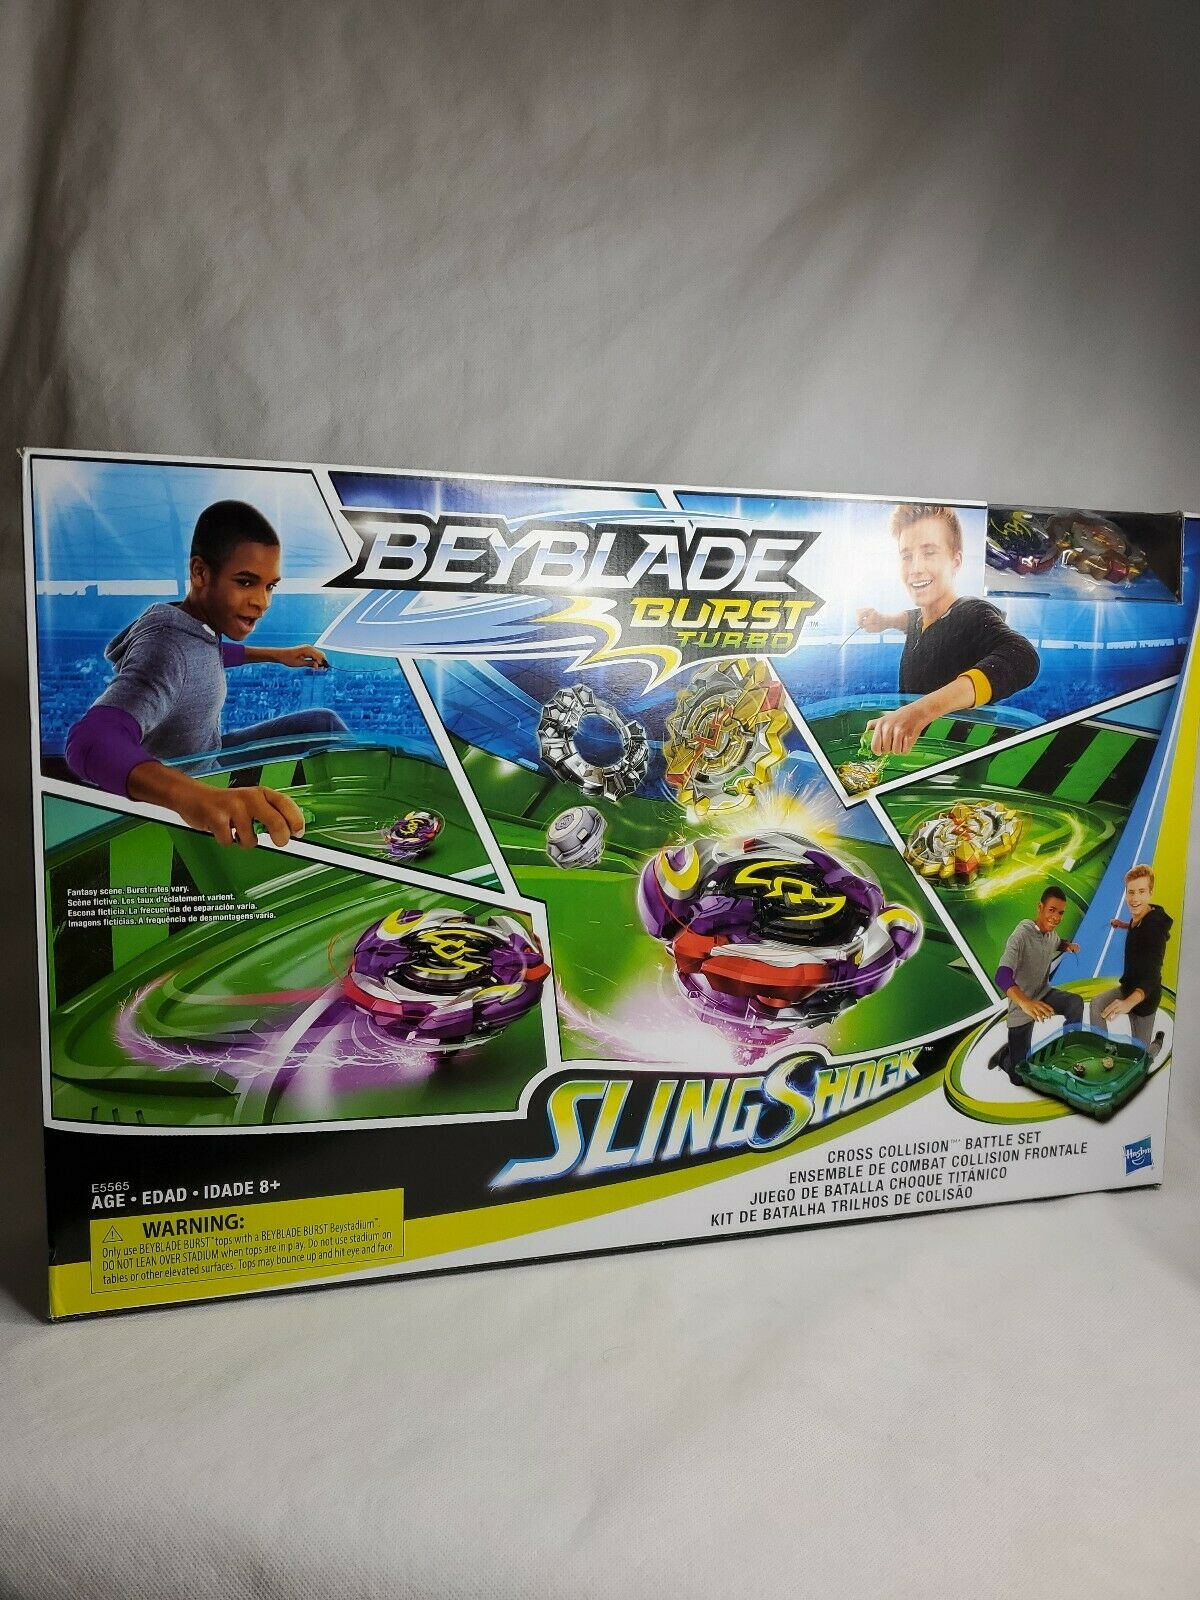 Beyblade Burst Turbo Slingshock Cross Collission battle Set Stadium Hasbro New